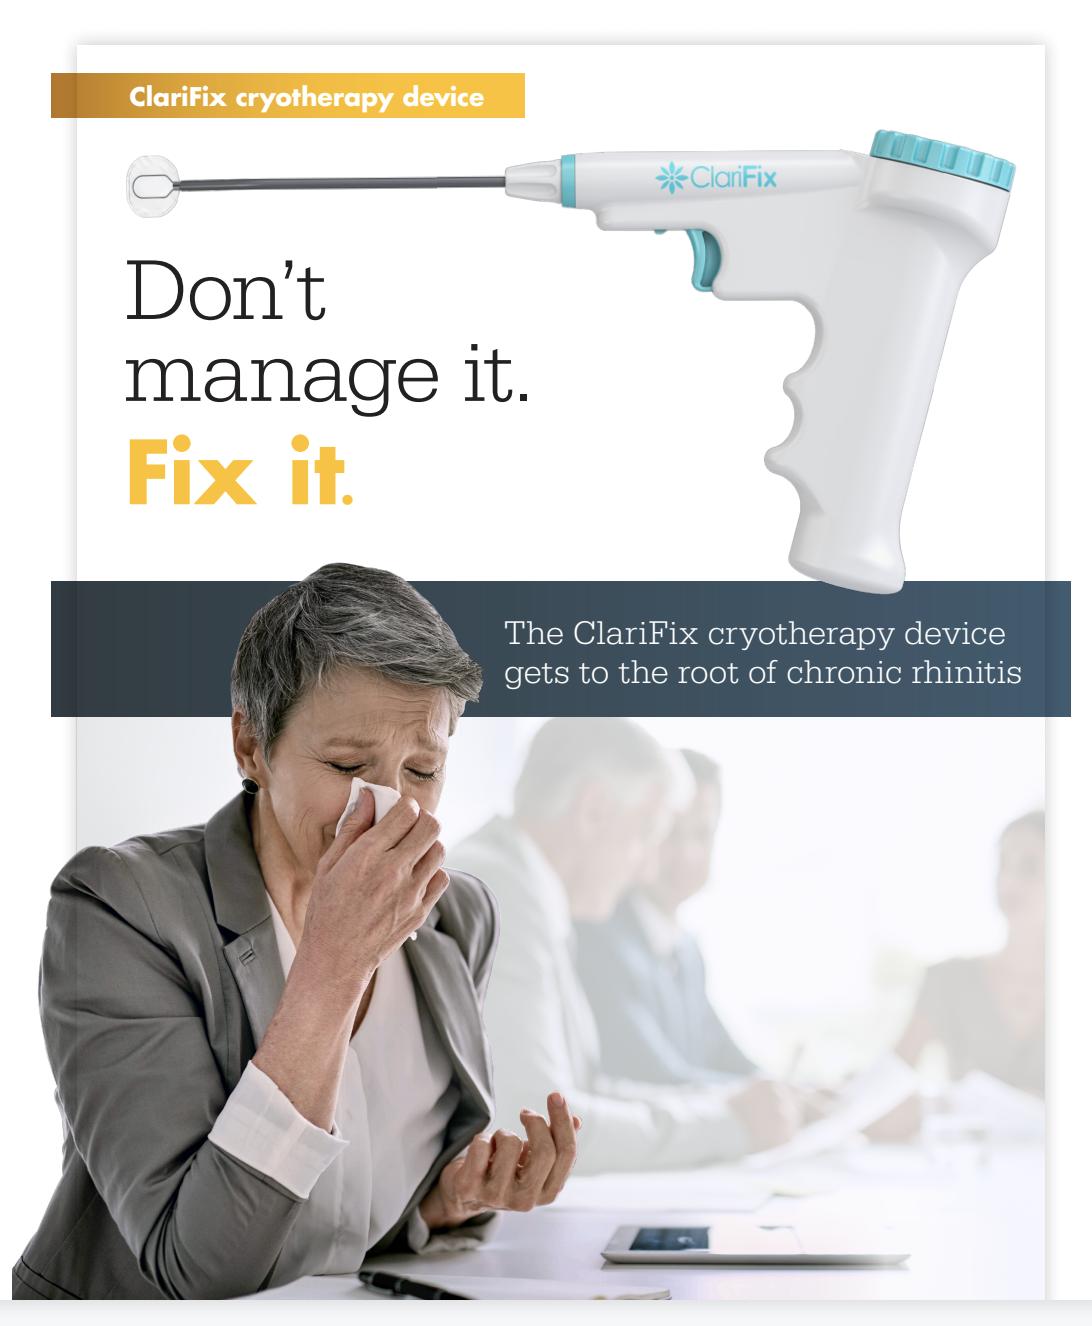 ClariFix® cryotherapy for rhinitis treatment